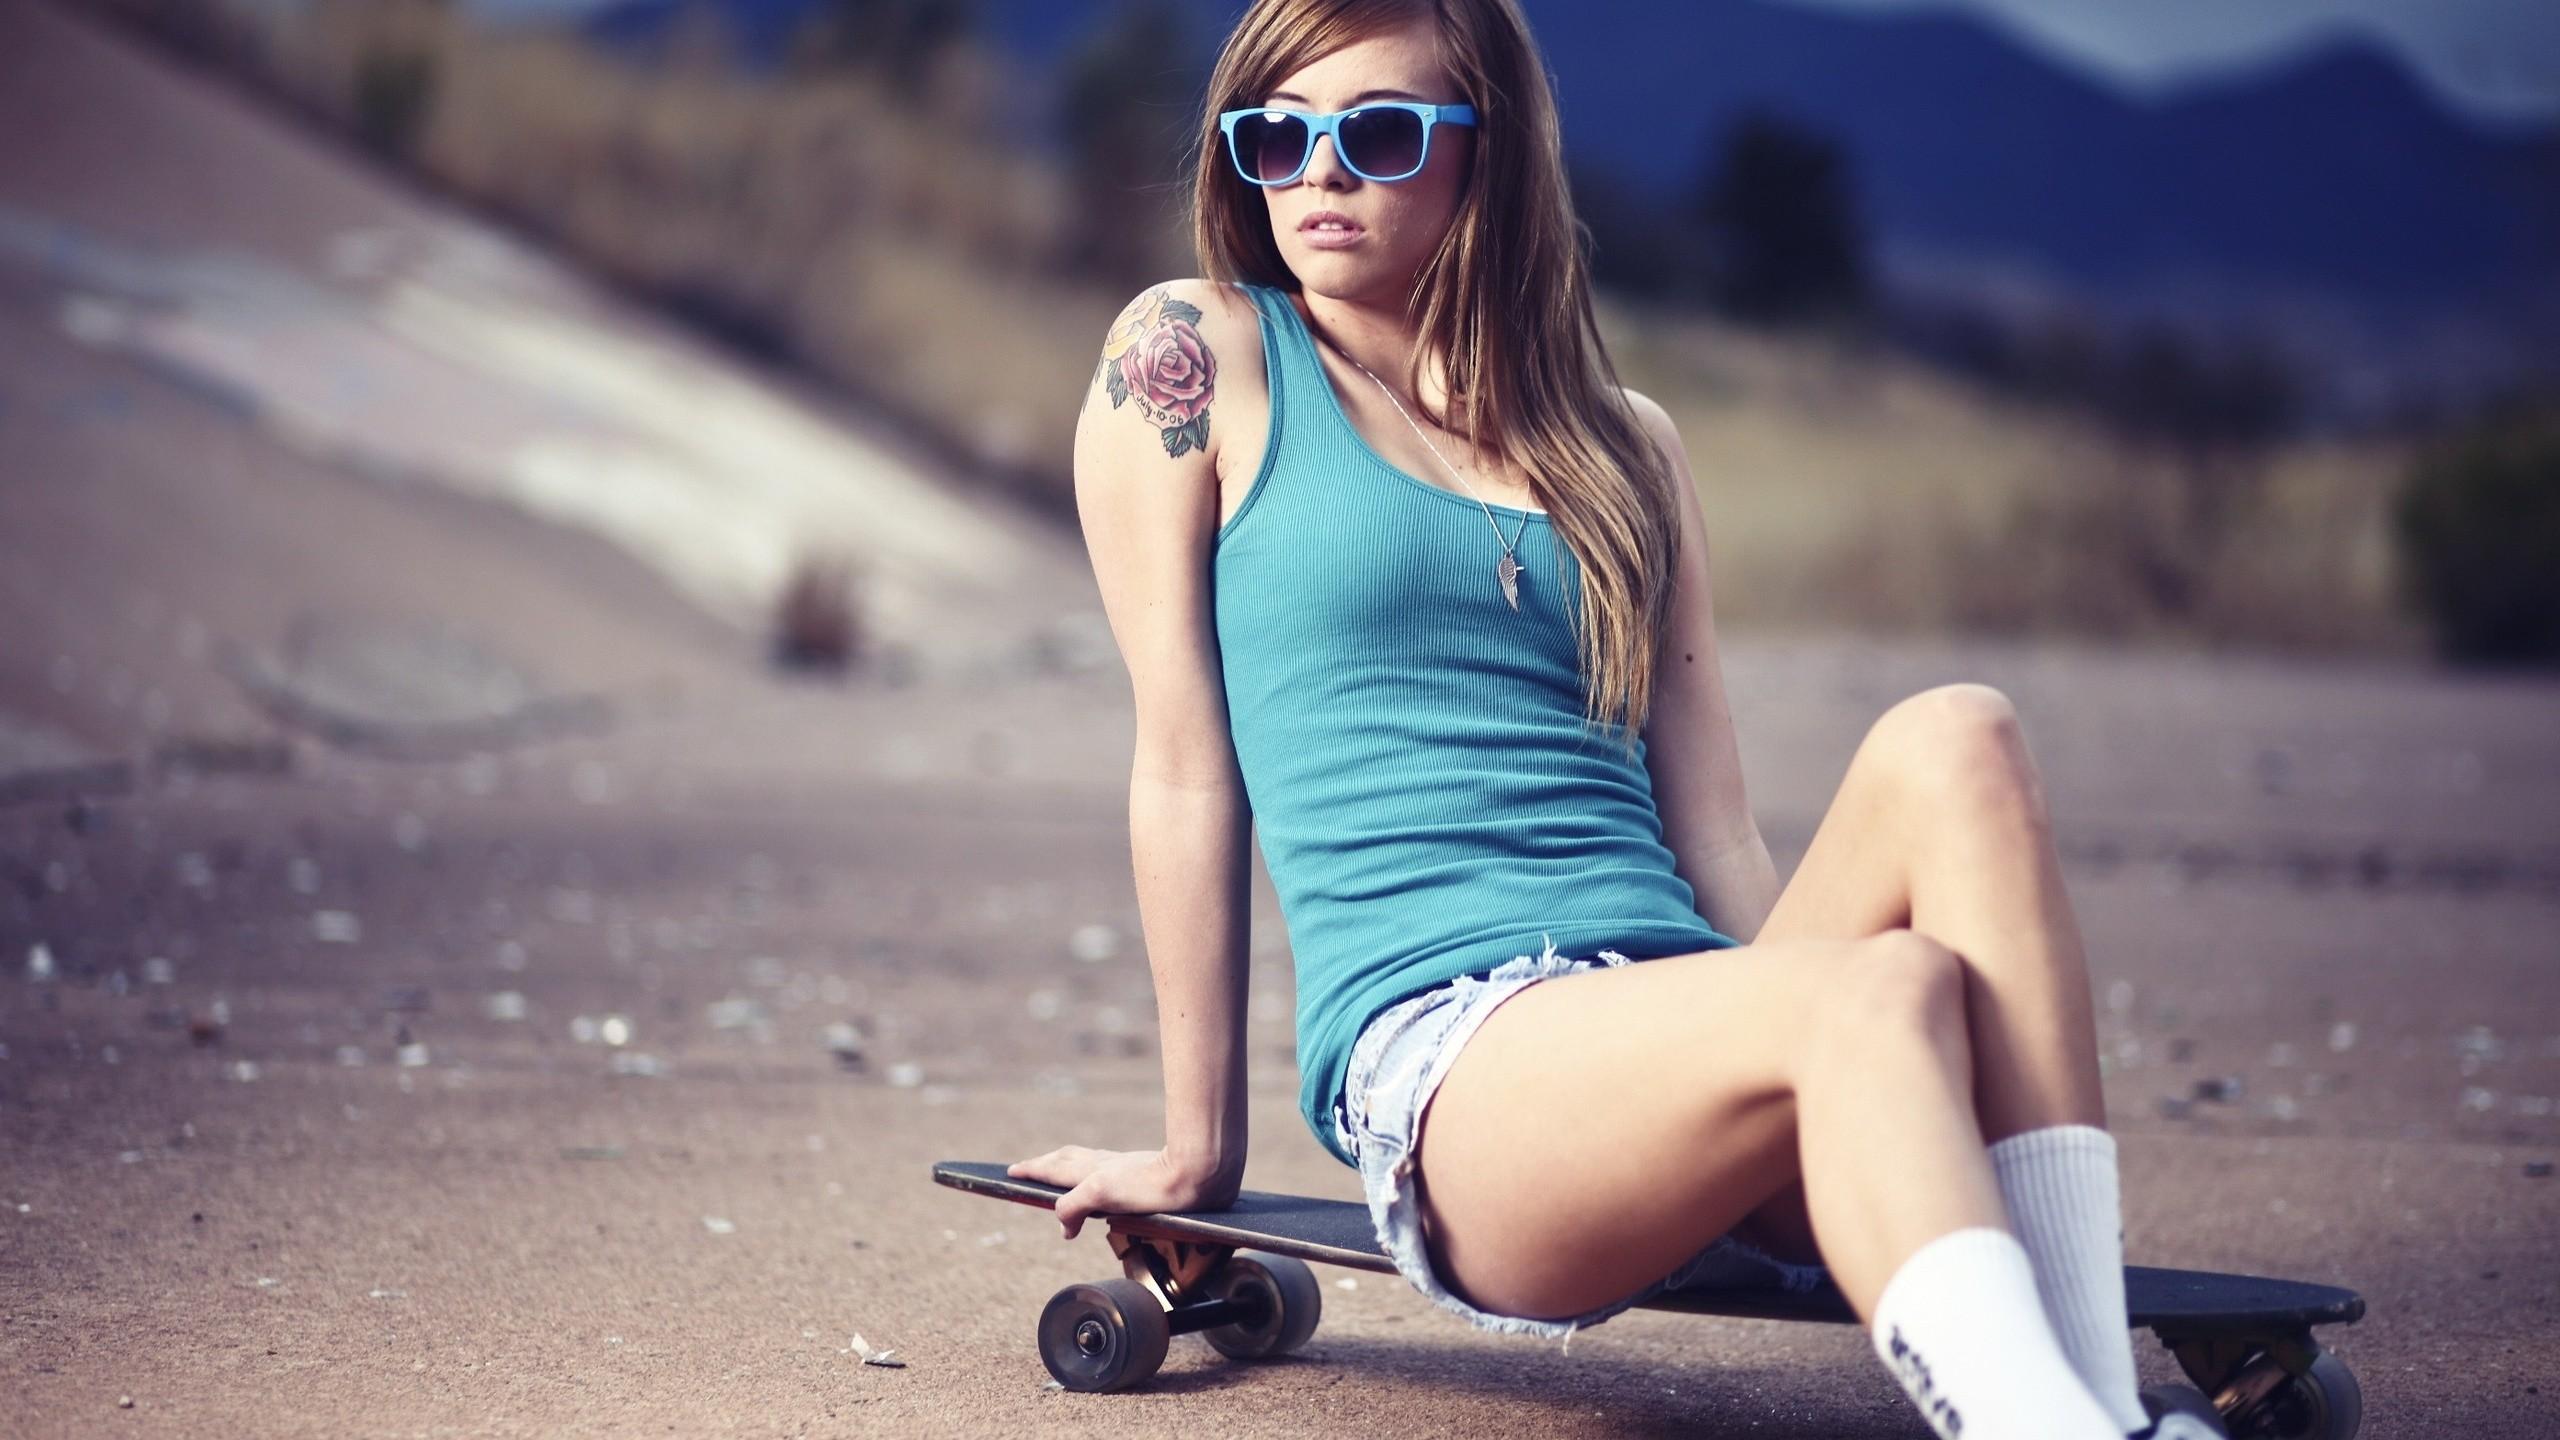 Girl Skateboard Wallpaper HD 756